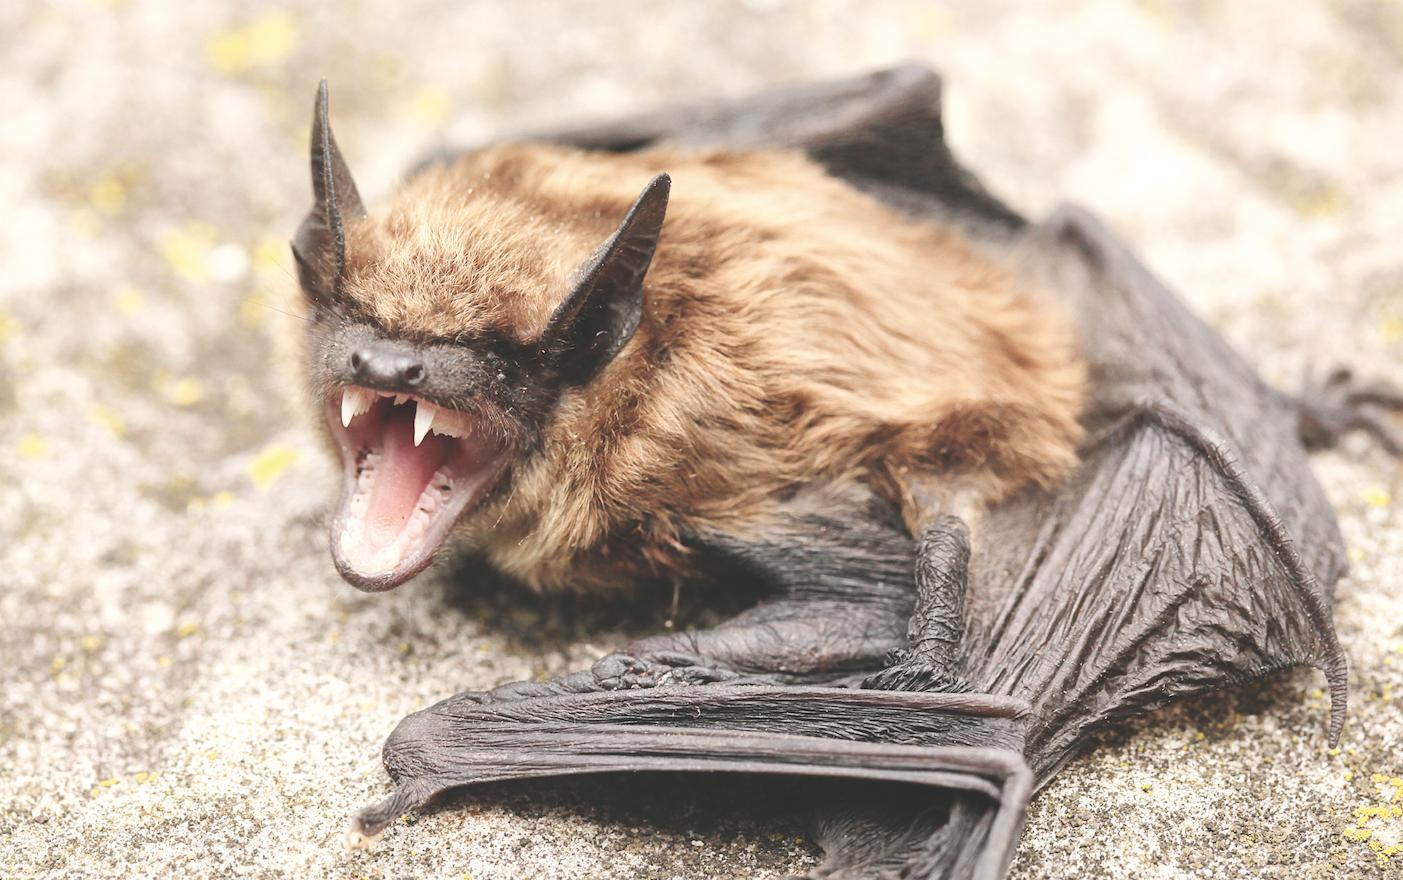 Preocupa murciélago con rabia en Manassas